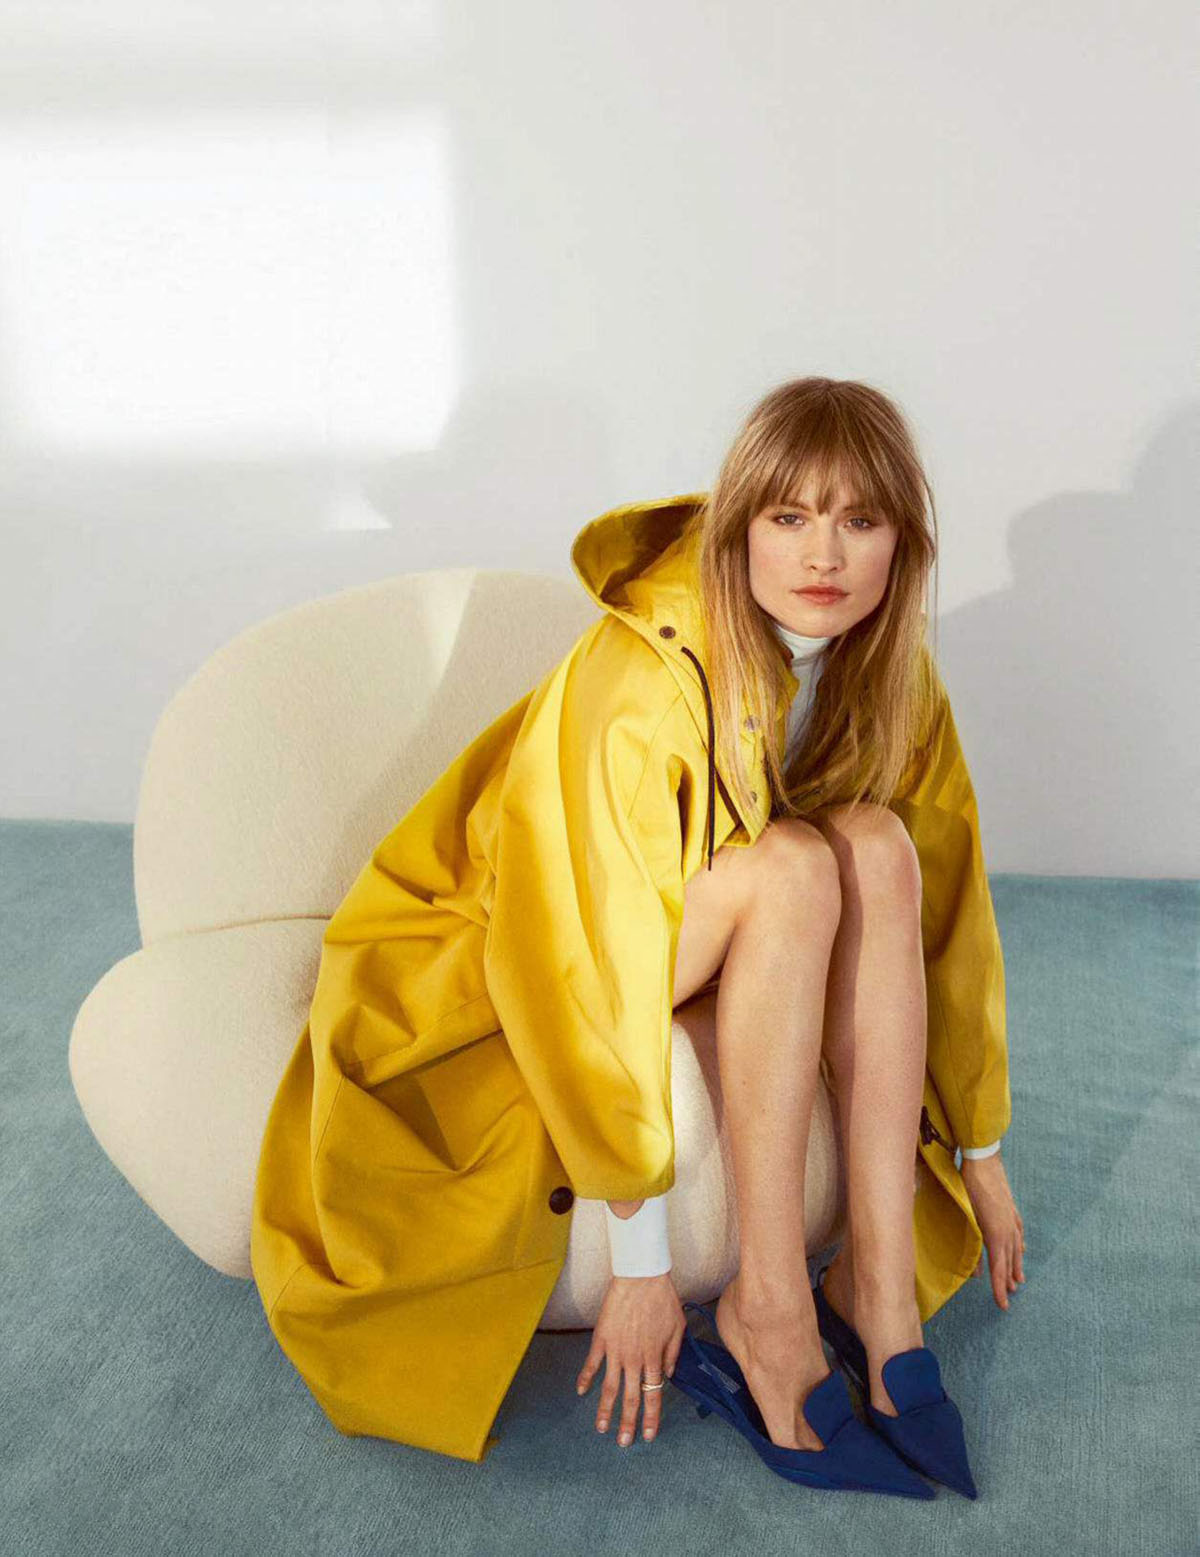 Klara Kristin covers Elle France April 23rd, 2021 by Ceen Wahren